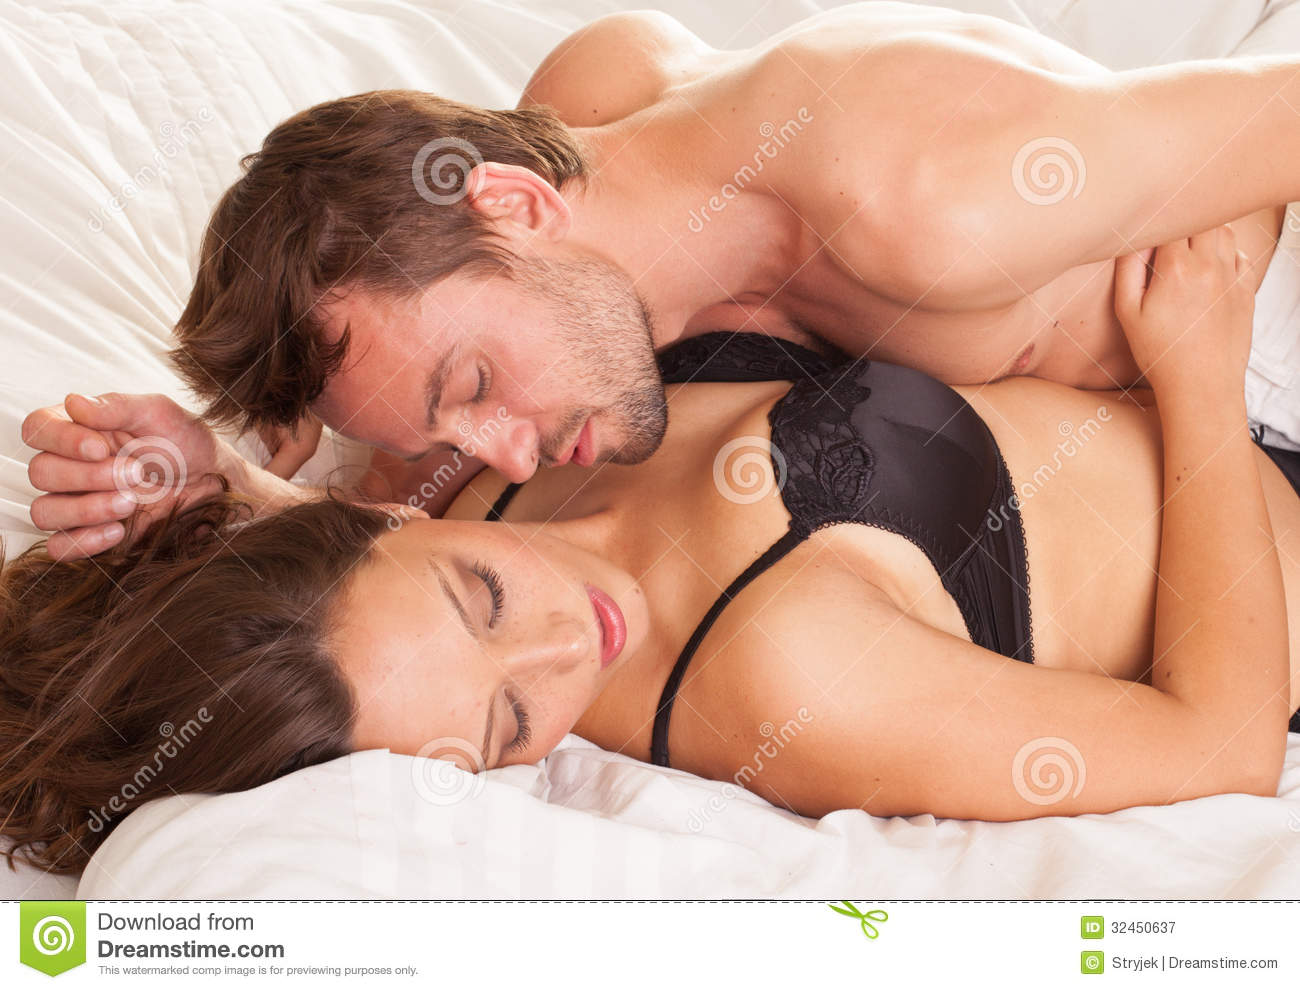 Men and women night sex videos 3gp  sexy videos